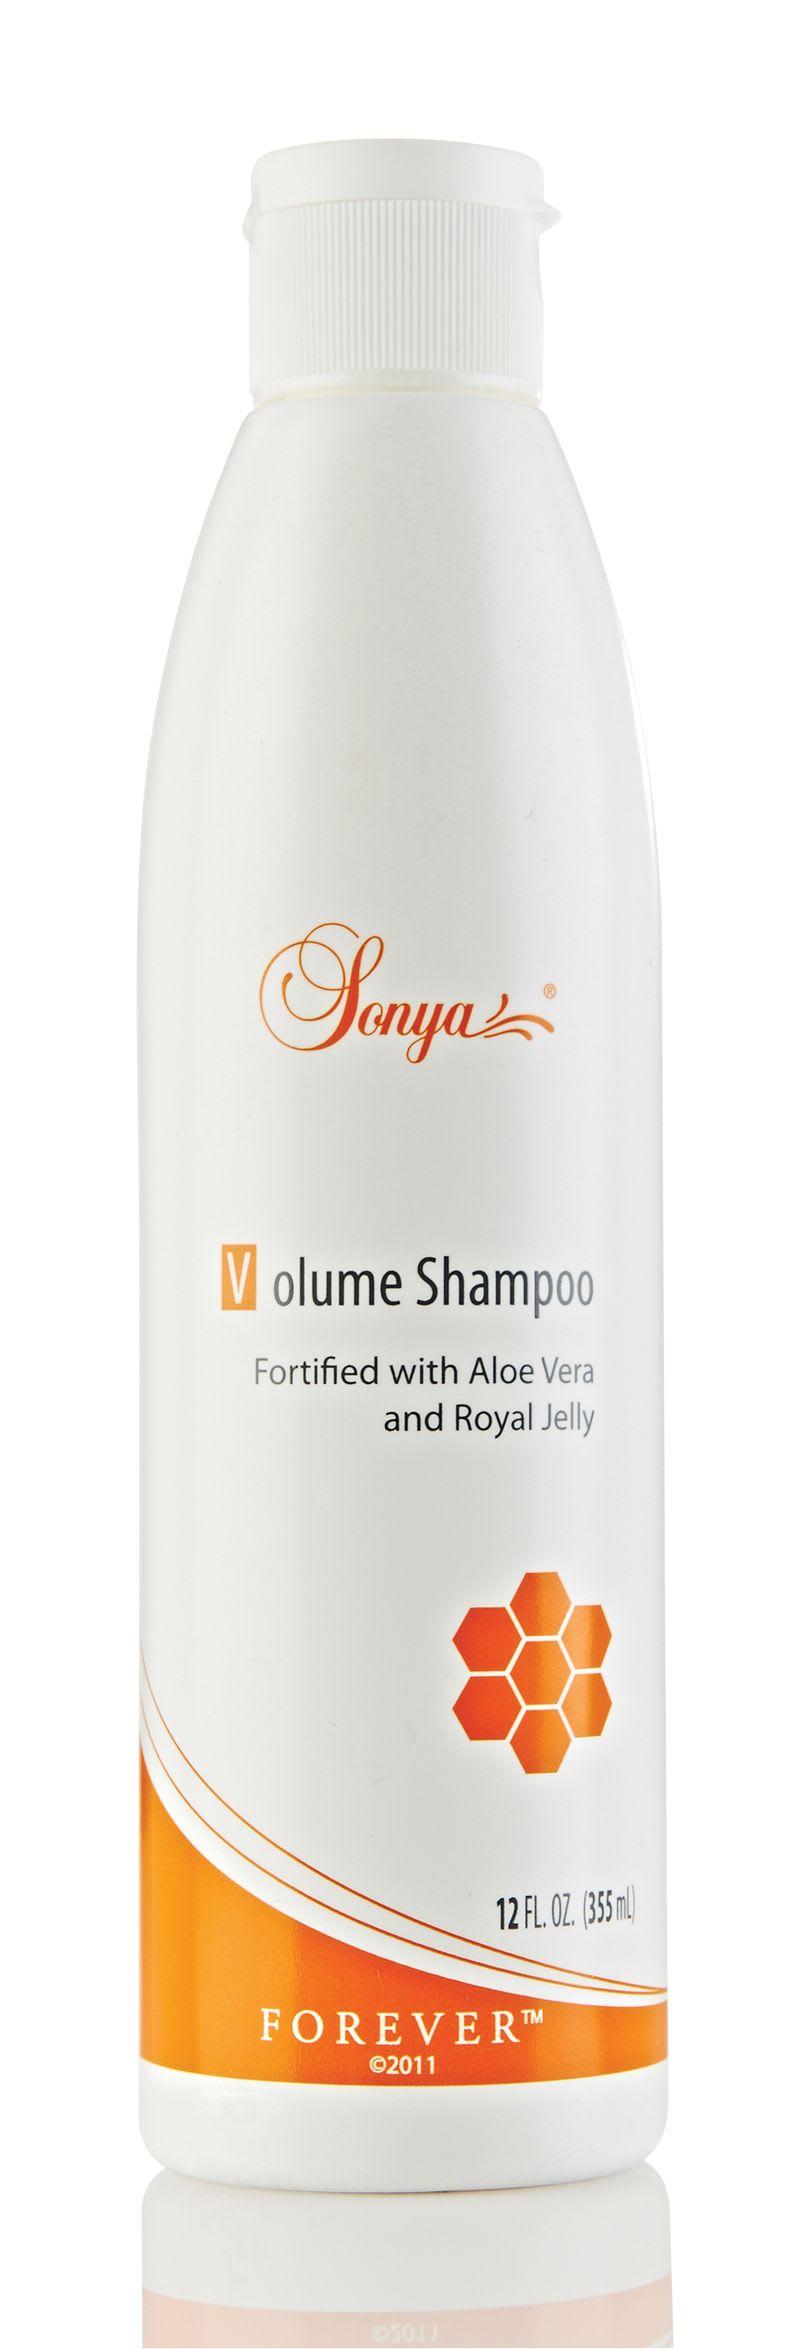 Forever Sonya Volume  Shampoo